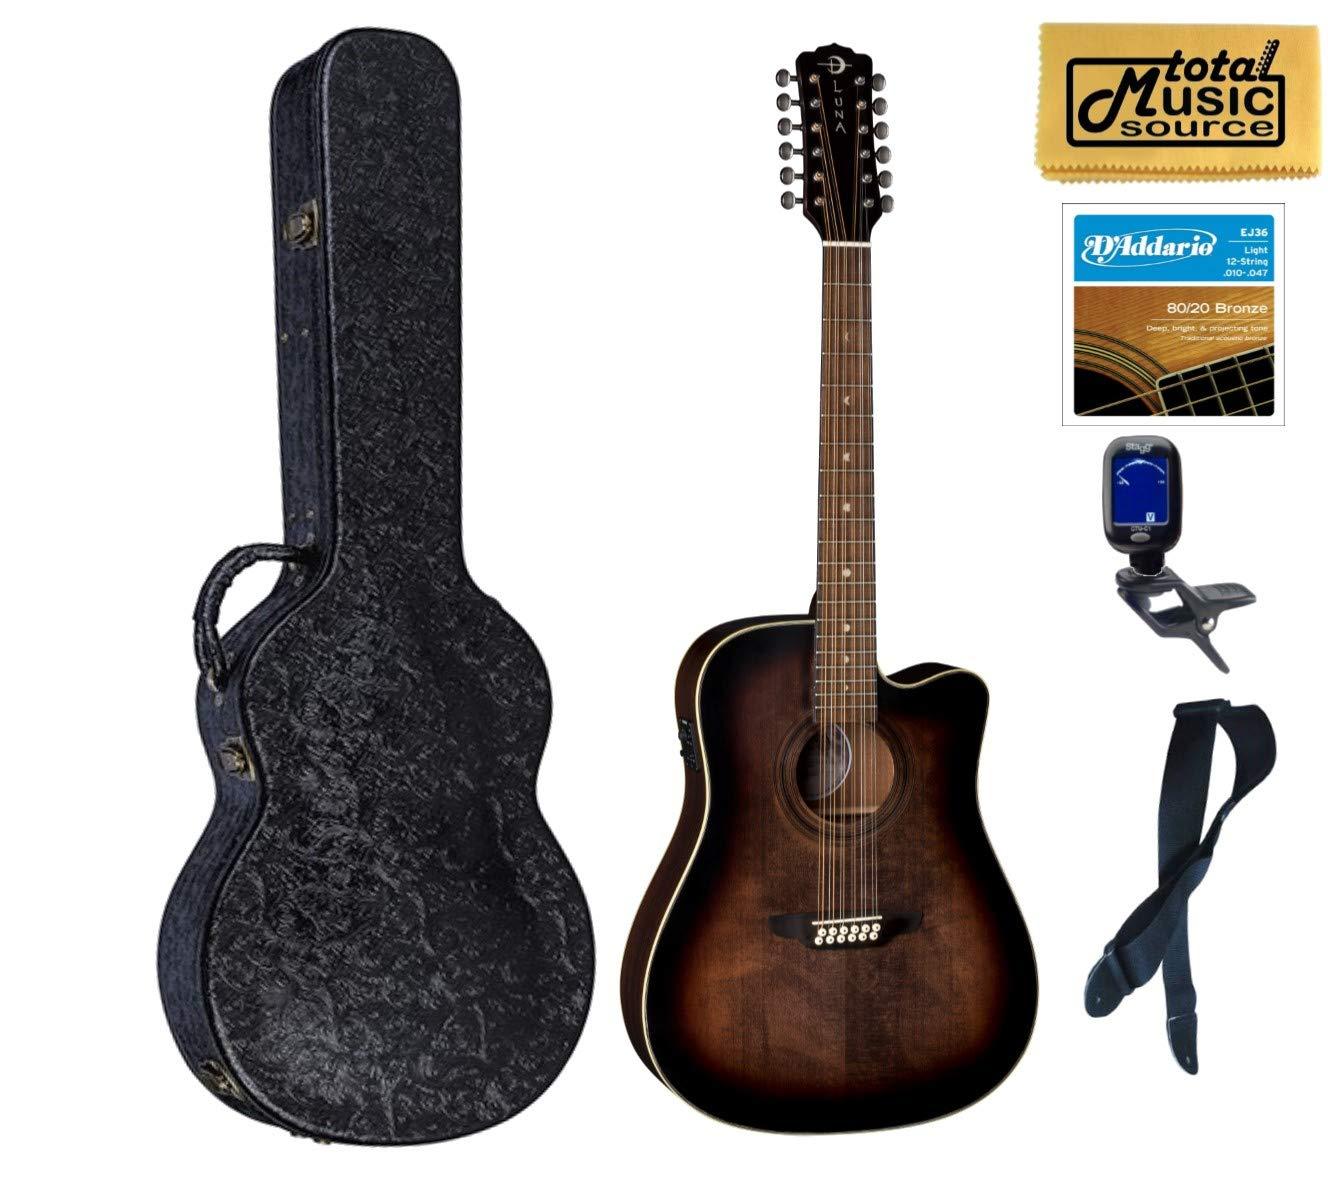 Luna Guitars ART V DCE 12 Art Vintage12 Guitarra A/E, estuche rígido: Amazon.es: Instrumentos musicales